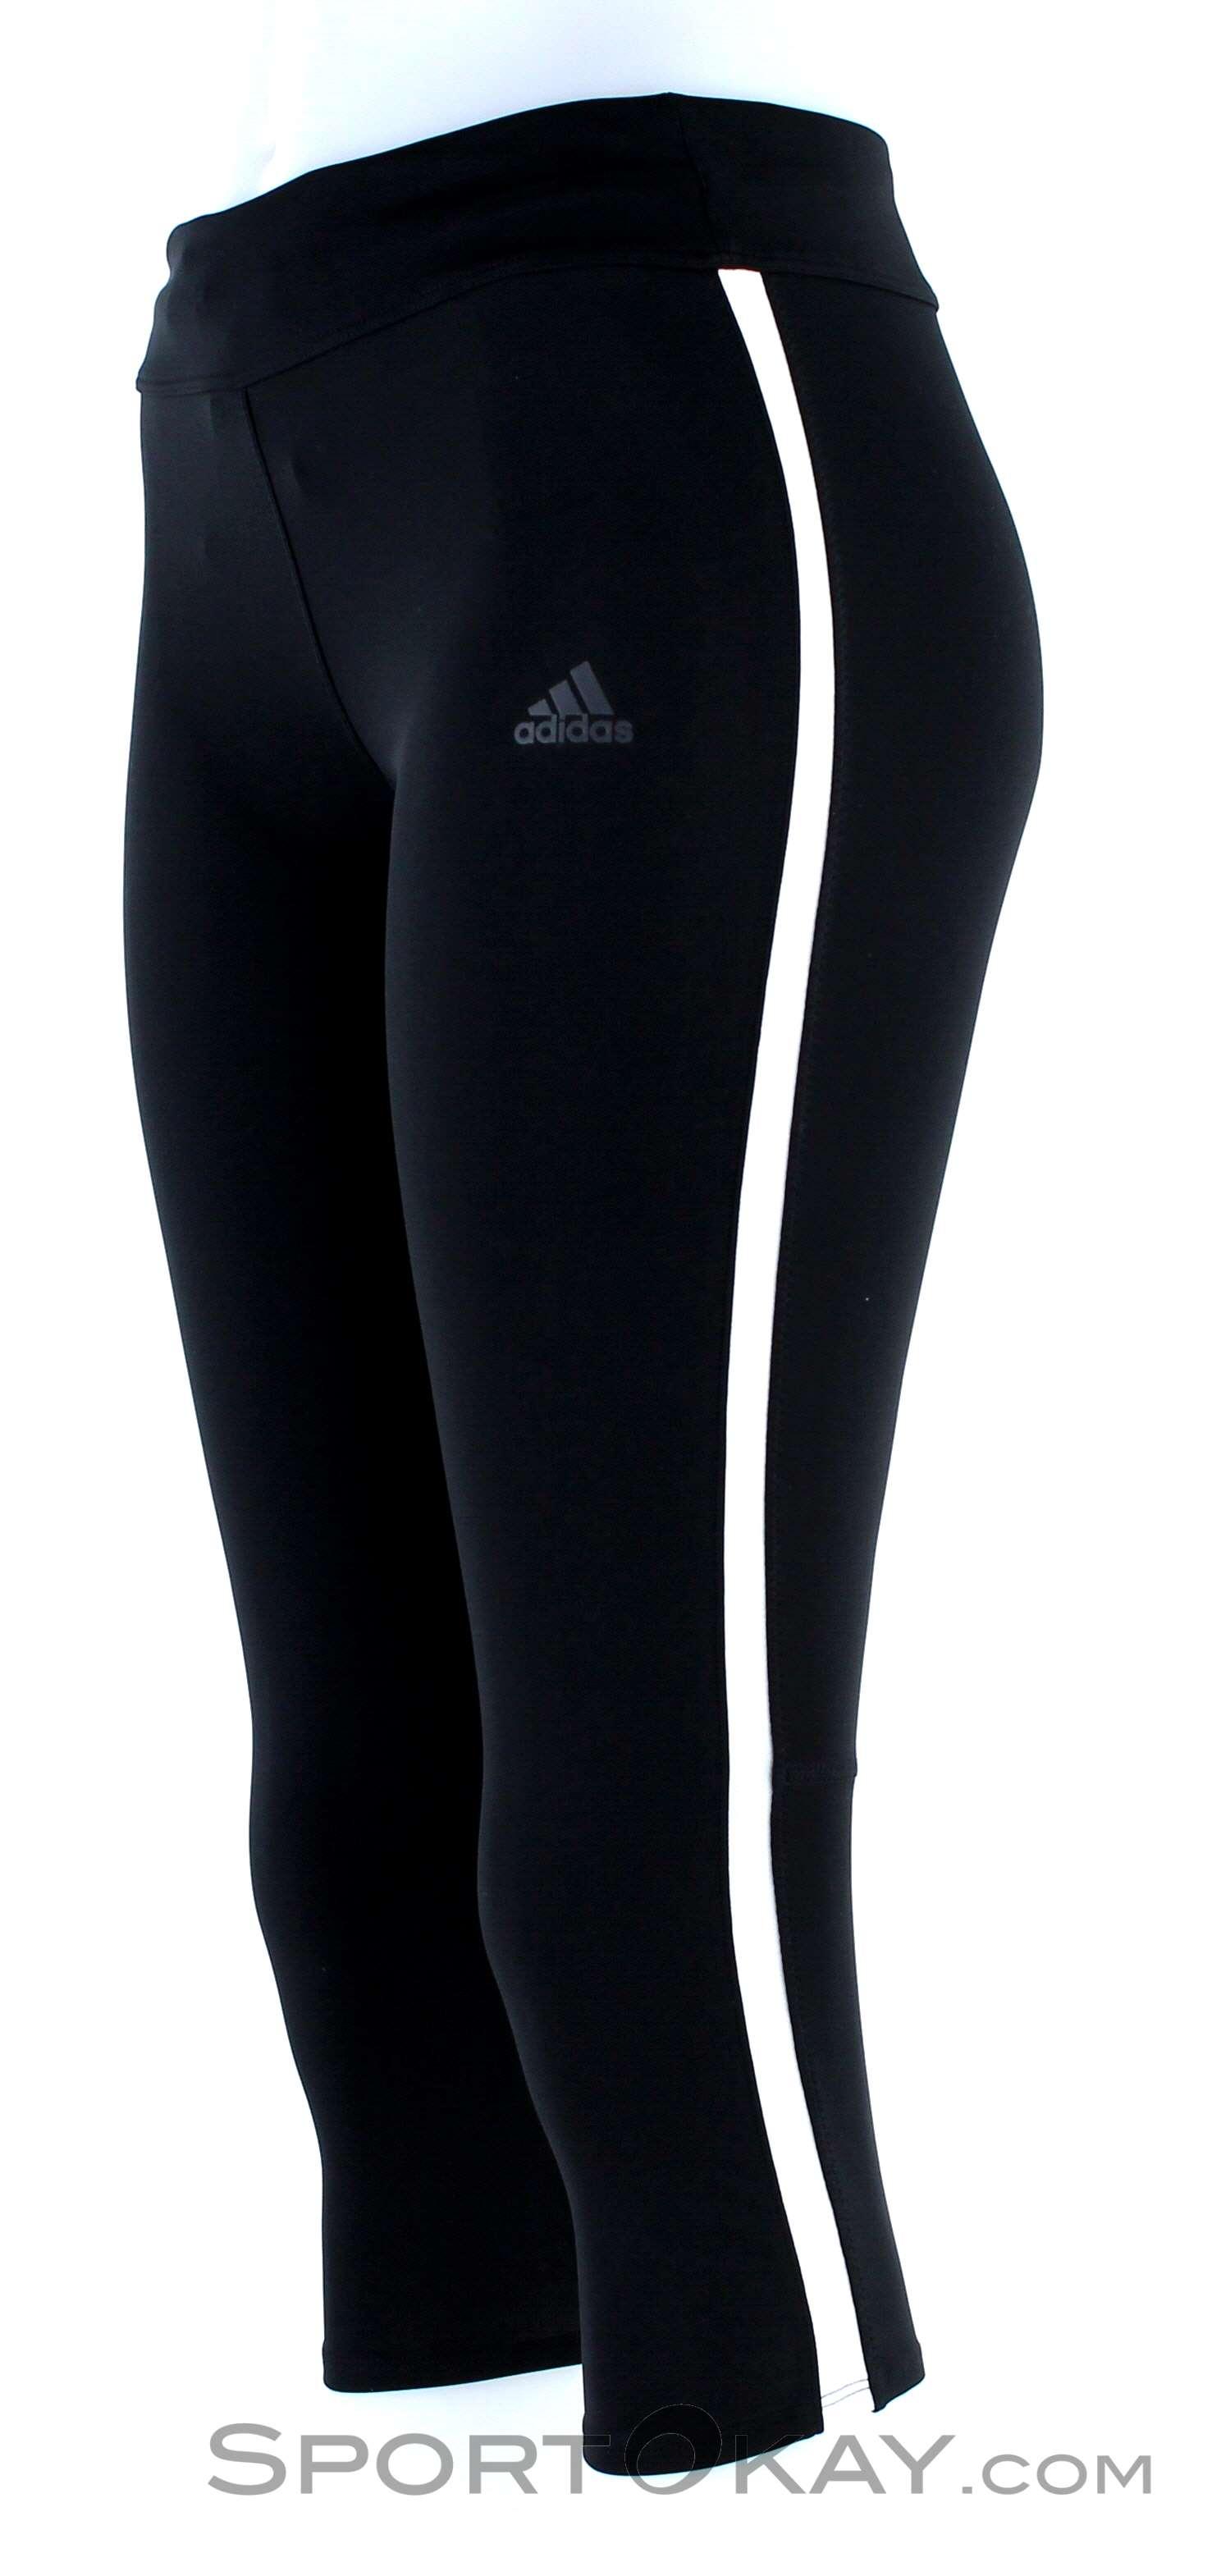 adidas Response 34 Tight Womens Leggings Pants Fitness